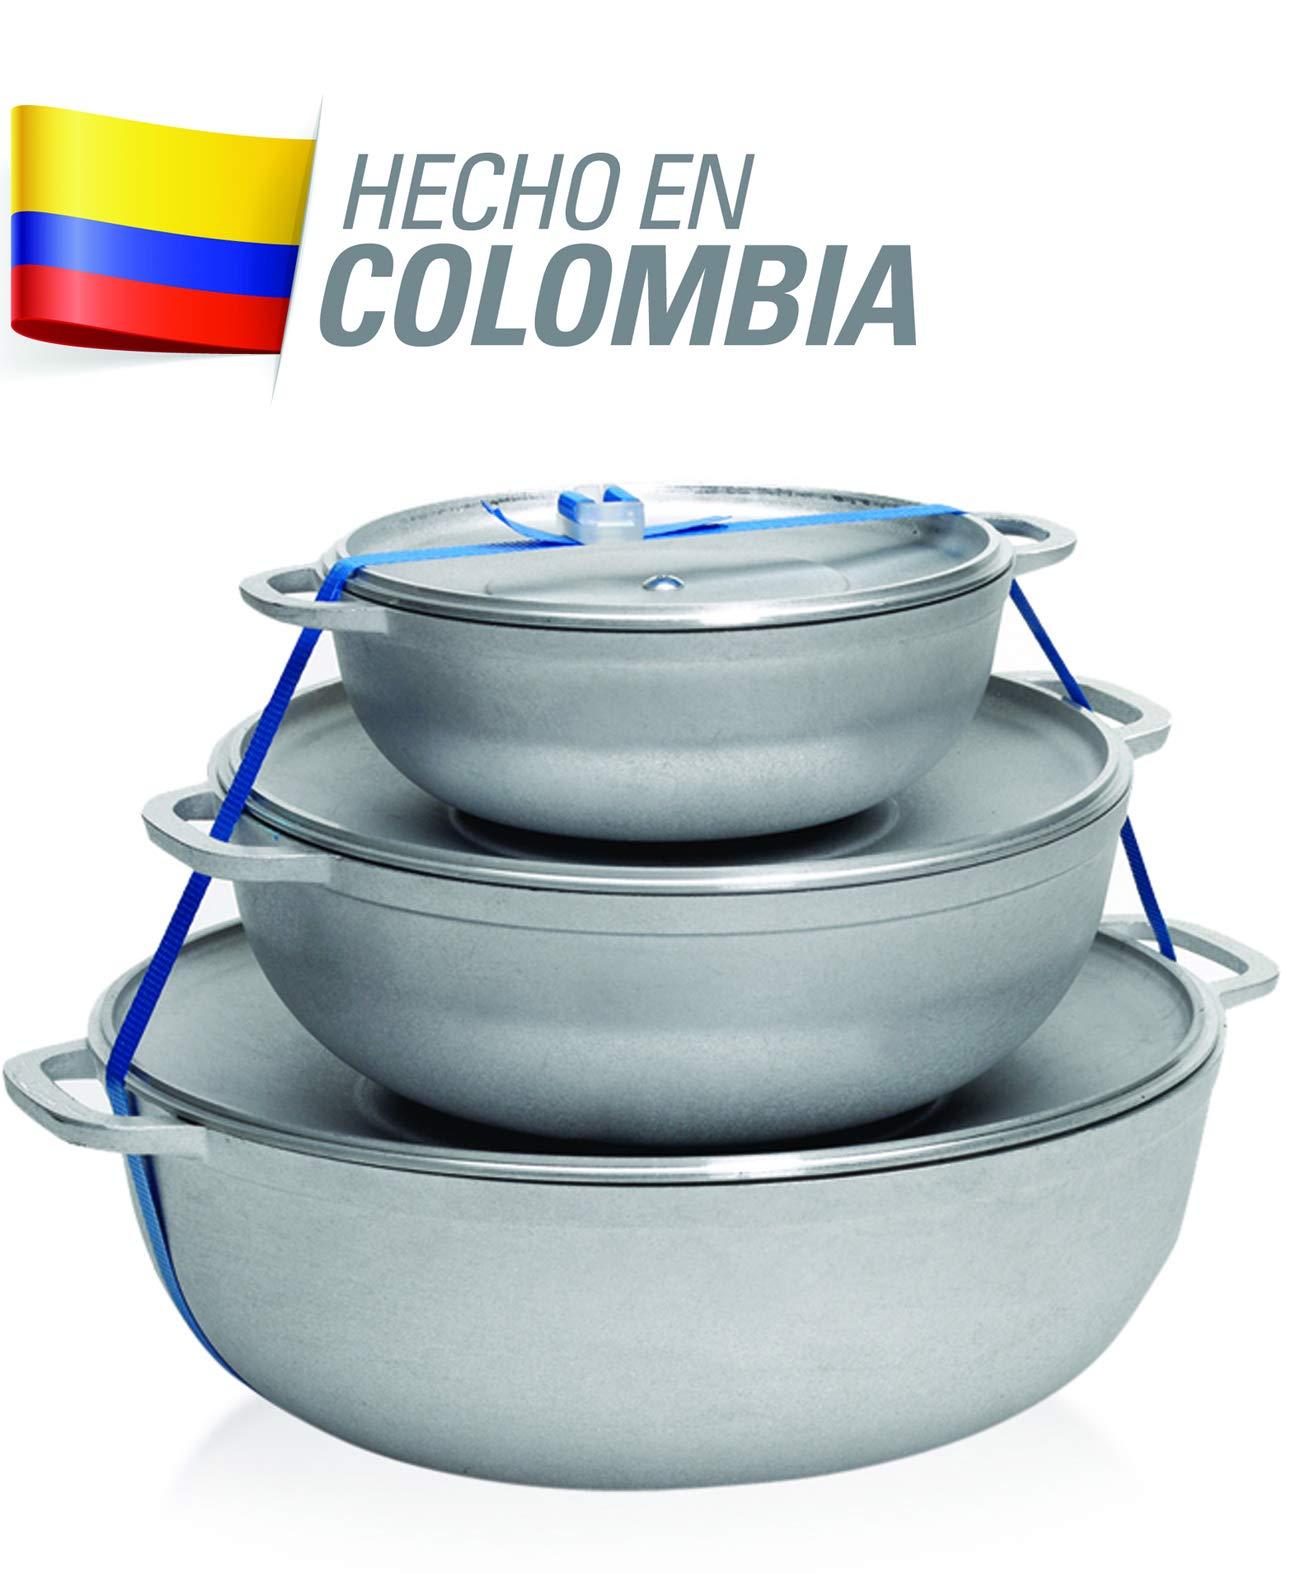 IMUSA USA R200-CALDERO22C Traditional Colombian Natural Caldero Set 3-Piece (1.6/3.2/4.6) Quart, Silver (Dutch Oven Set) by Imusa